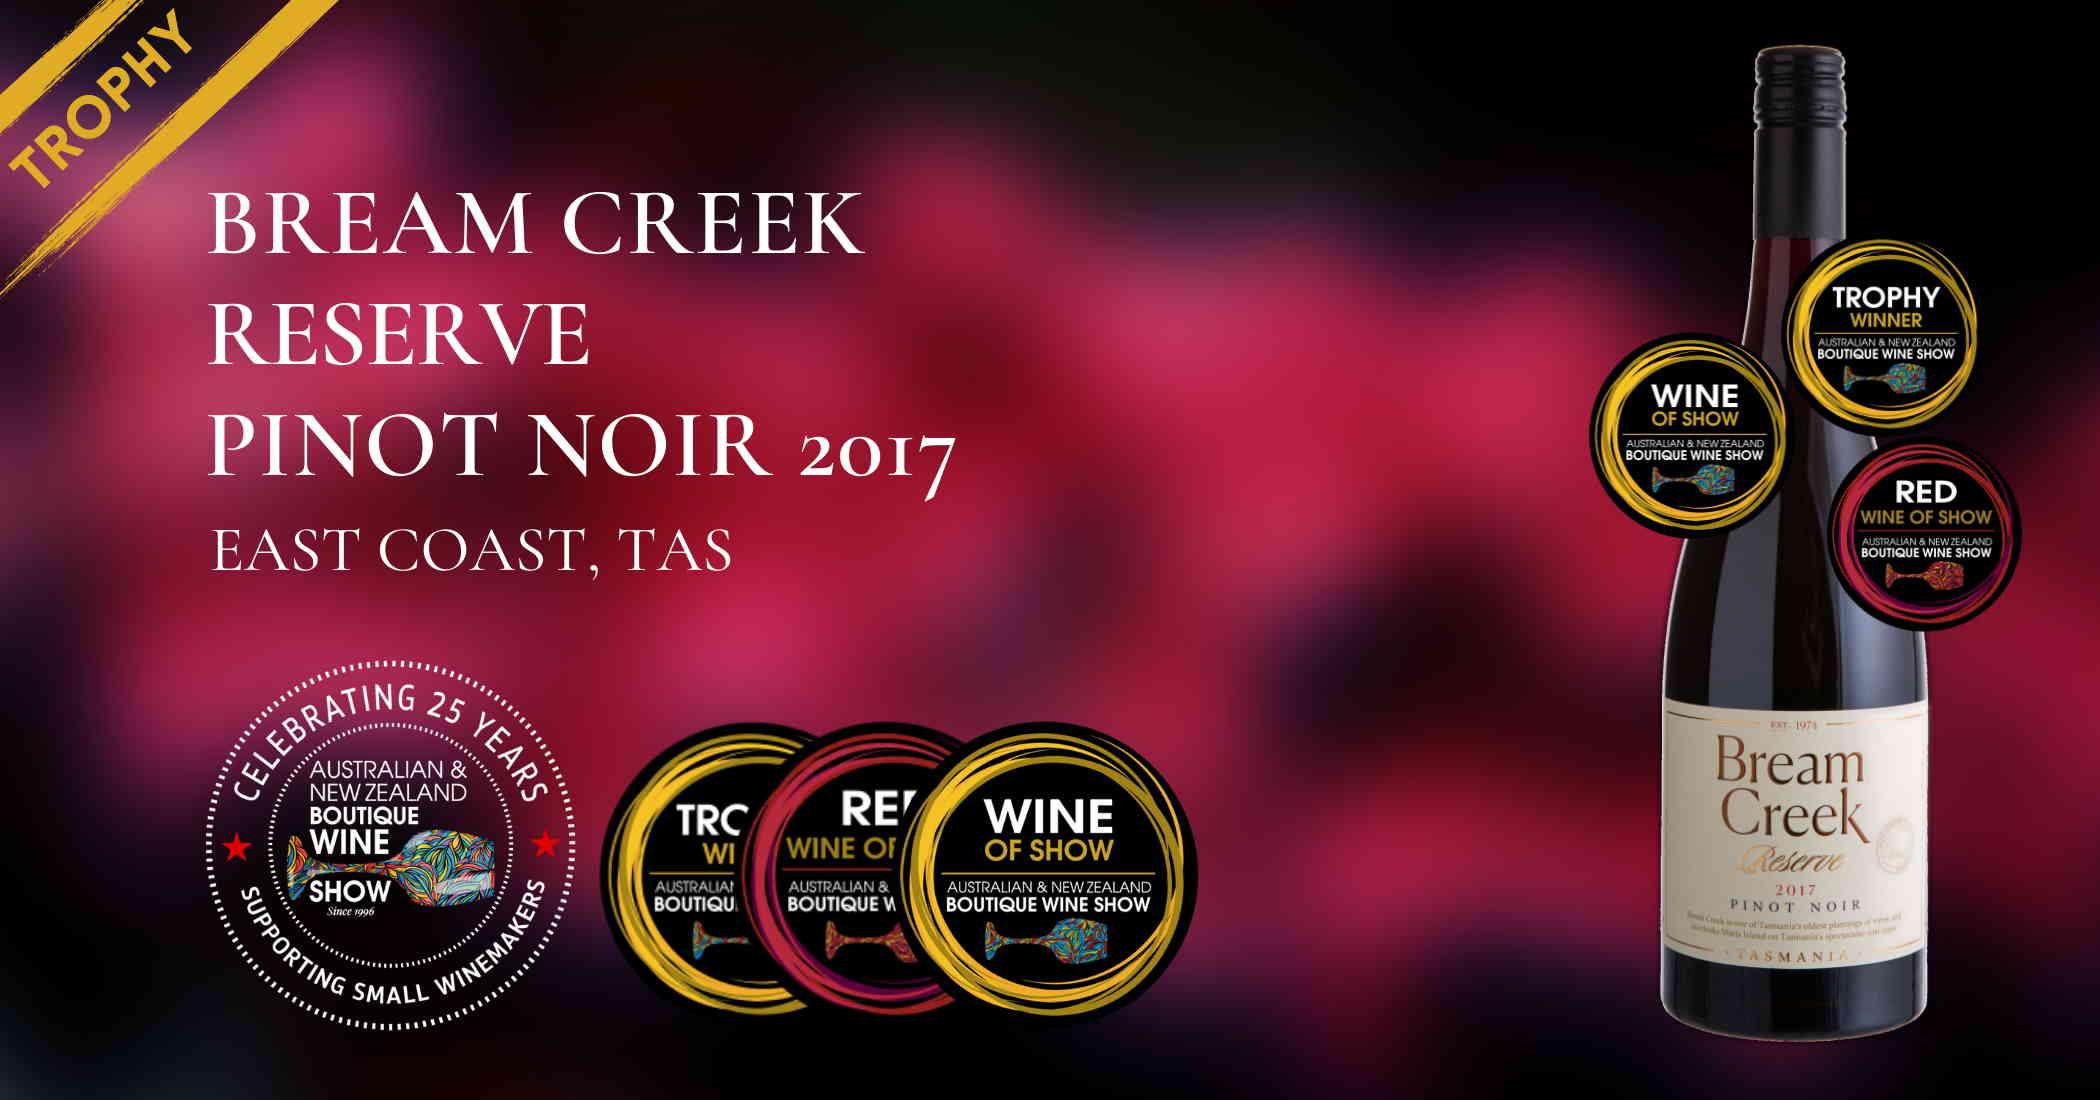 Bream Creek Reserve Pinot Noir 2017